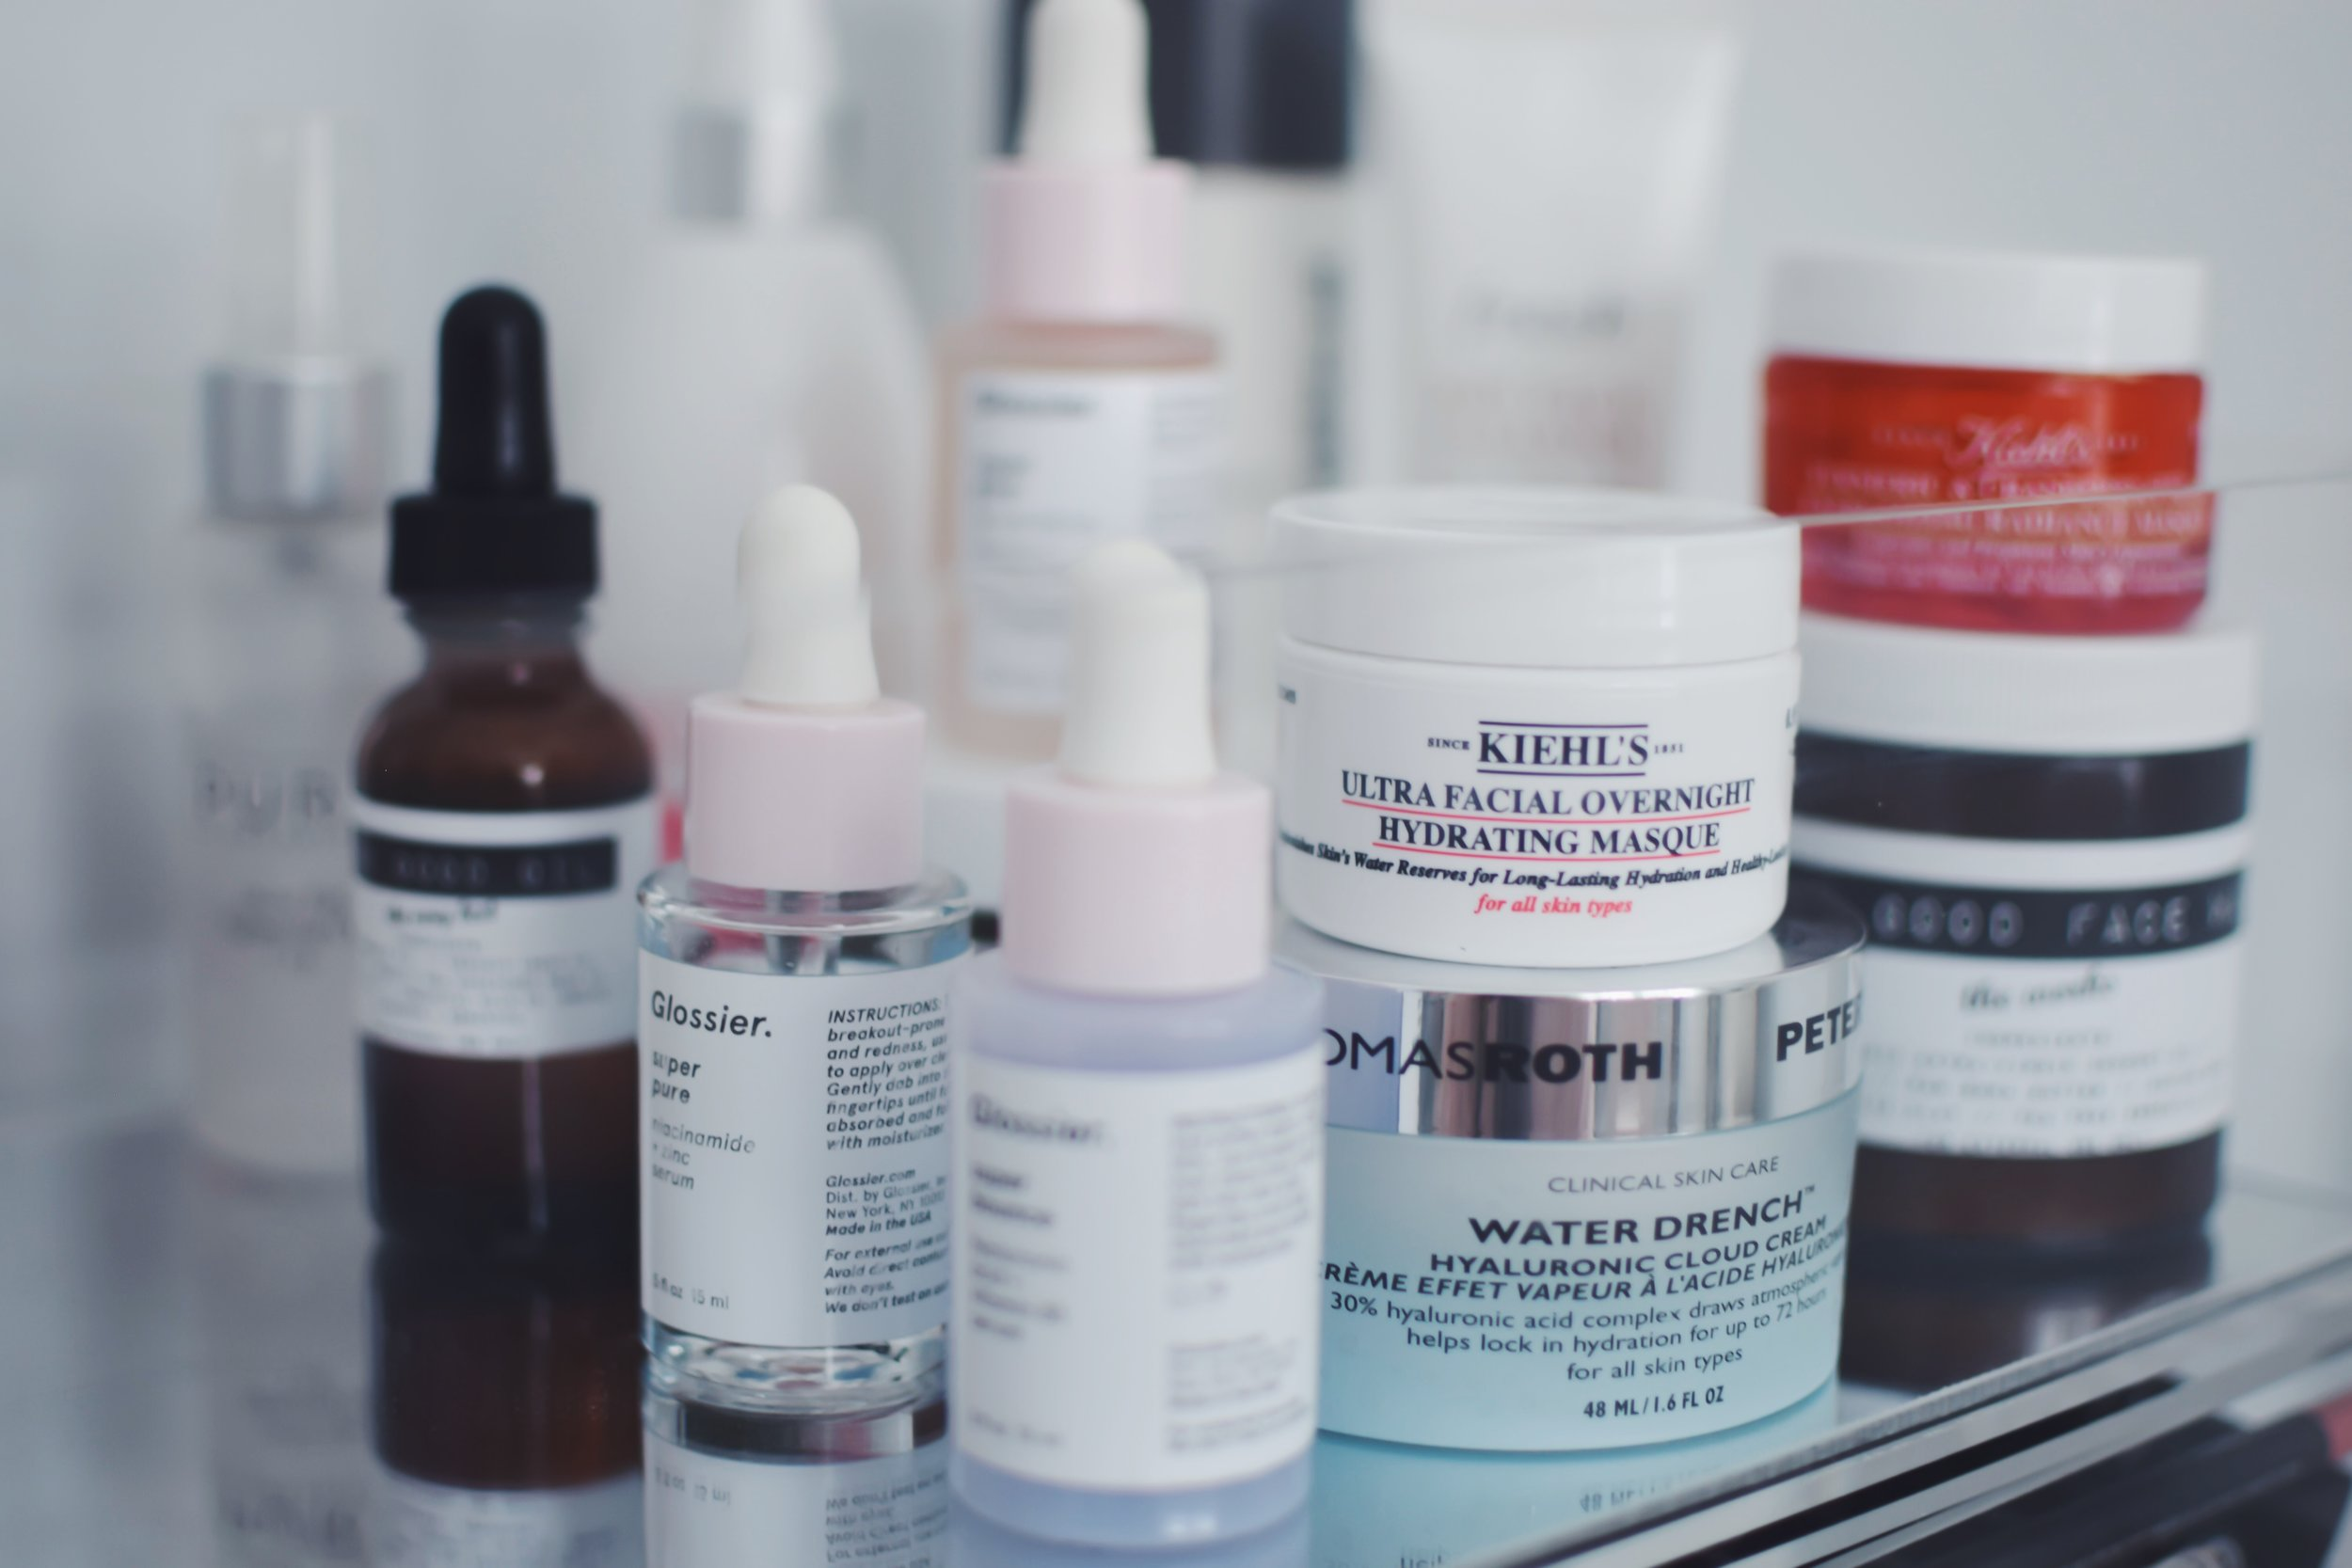 Winter Skincare Routine | Pine Barren Beauty | winter skincare products, must have skincare products, the best skincare products, how to take care of your skin